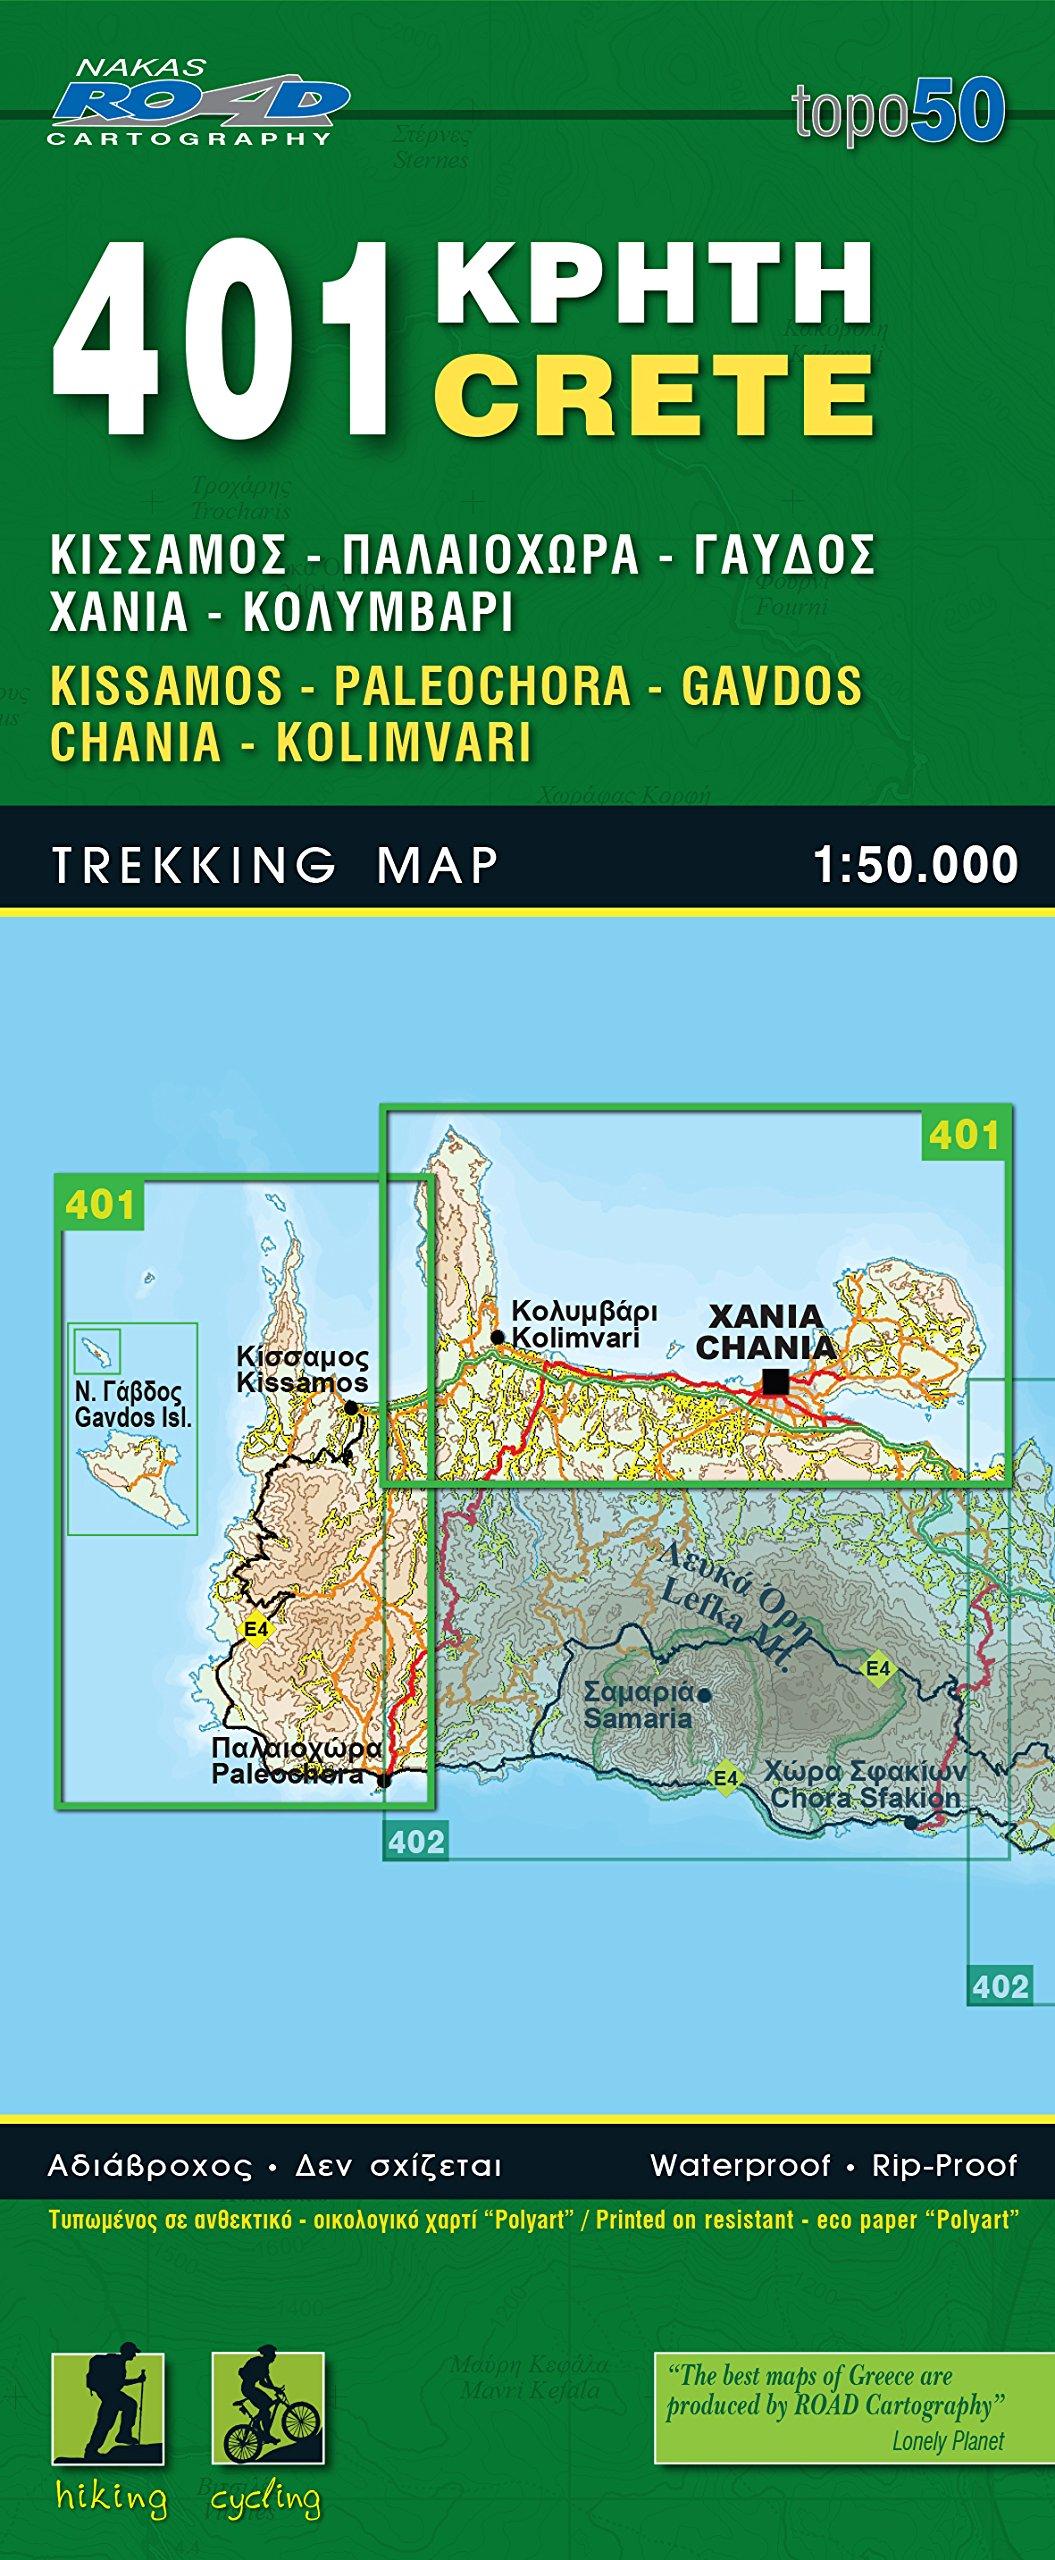 Kissamos - Paleochora - Gavdos - Chania - Kolimvari. Trekking map 1 : 50 000